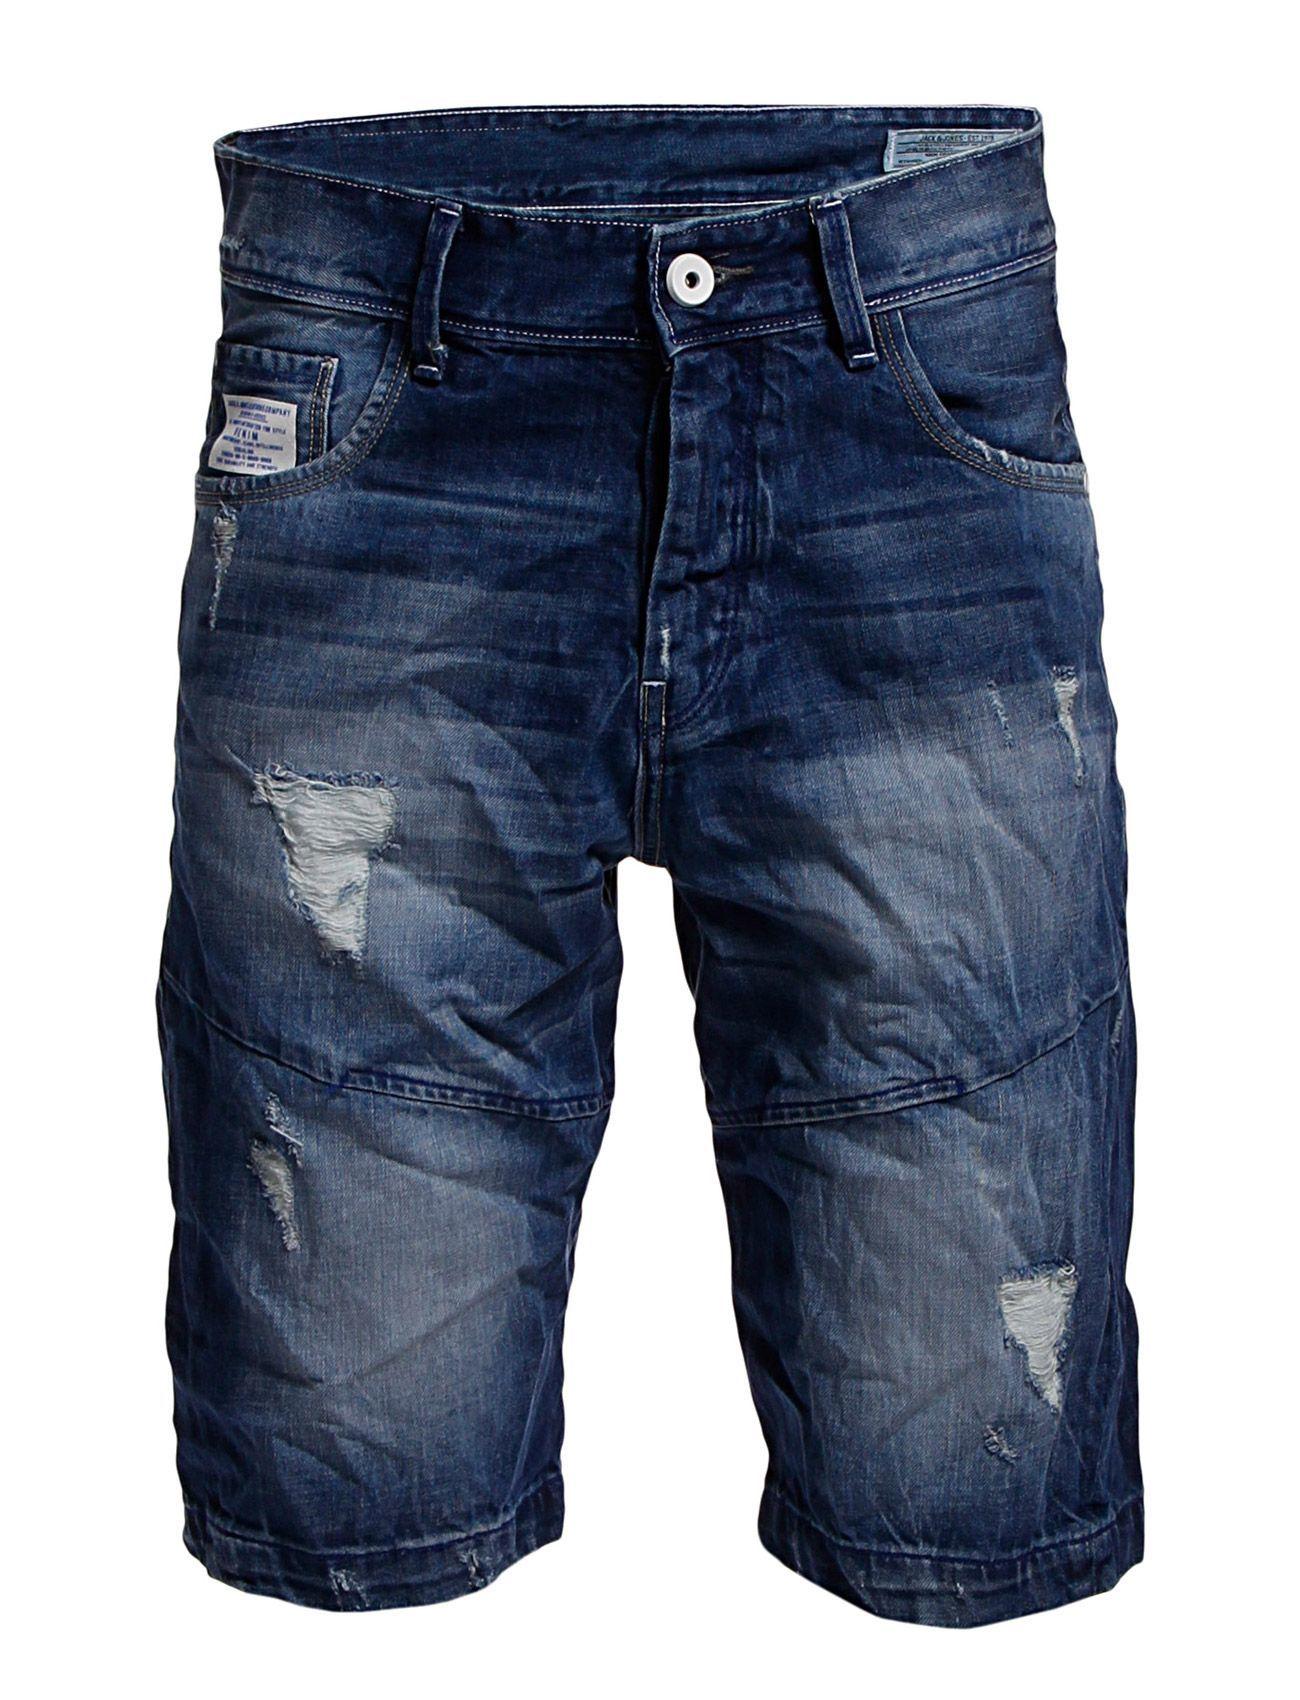 Men's|Women's Road Long Shorts Anti Sc 433 4-5-6 12